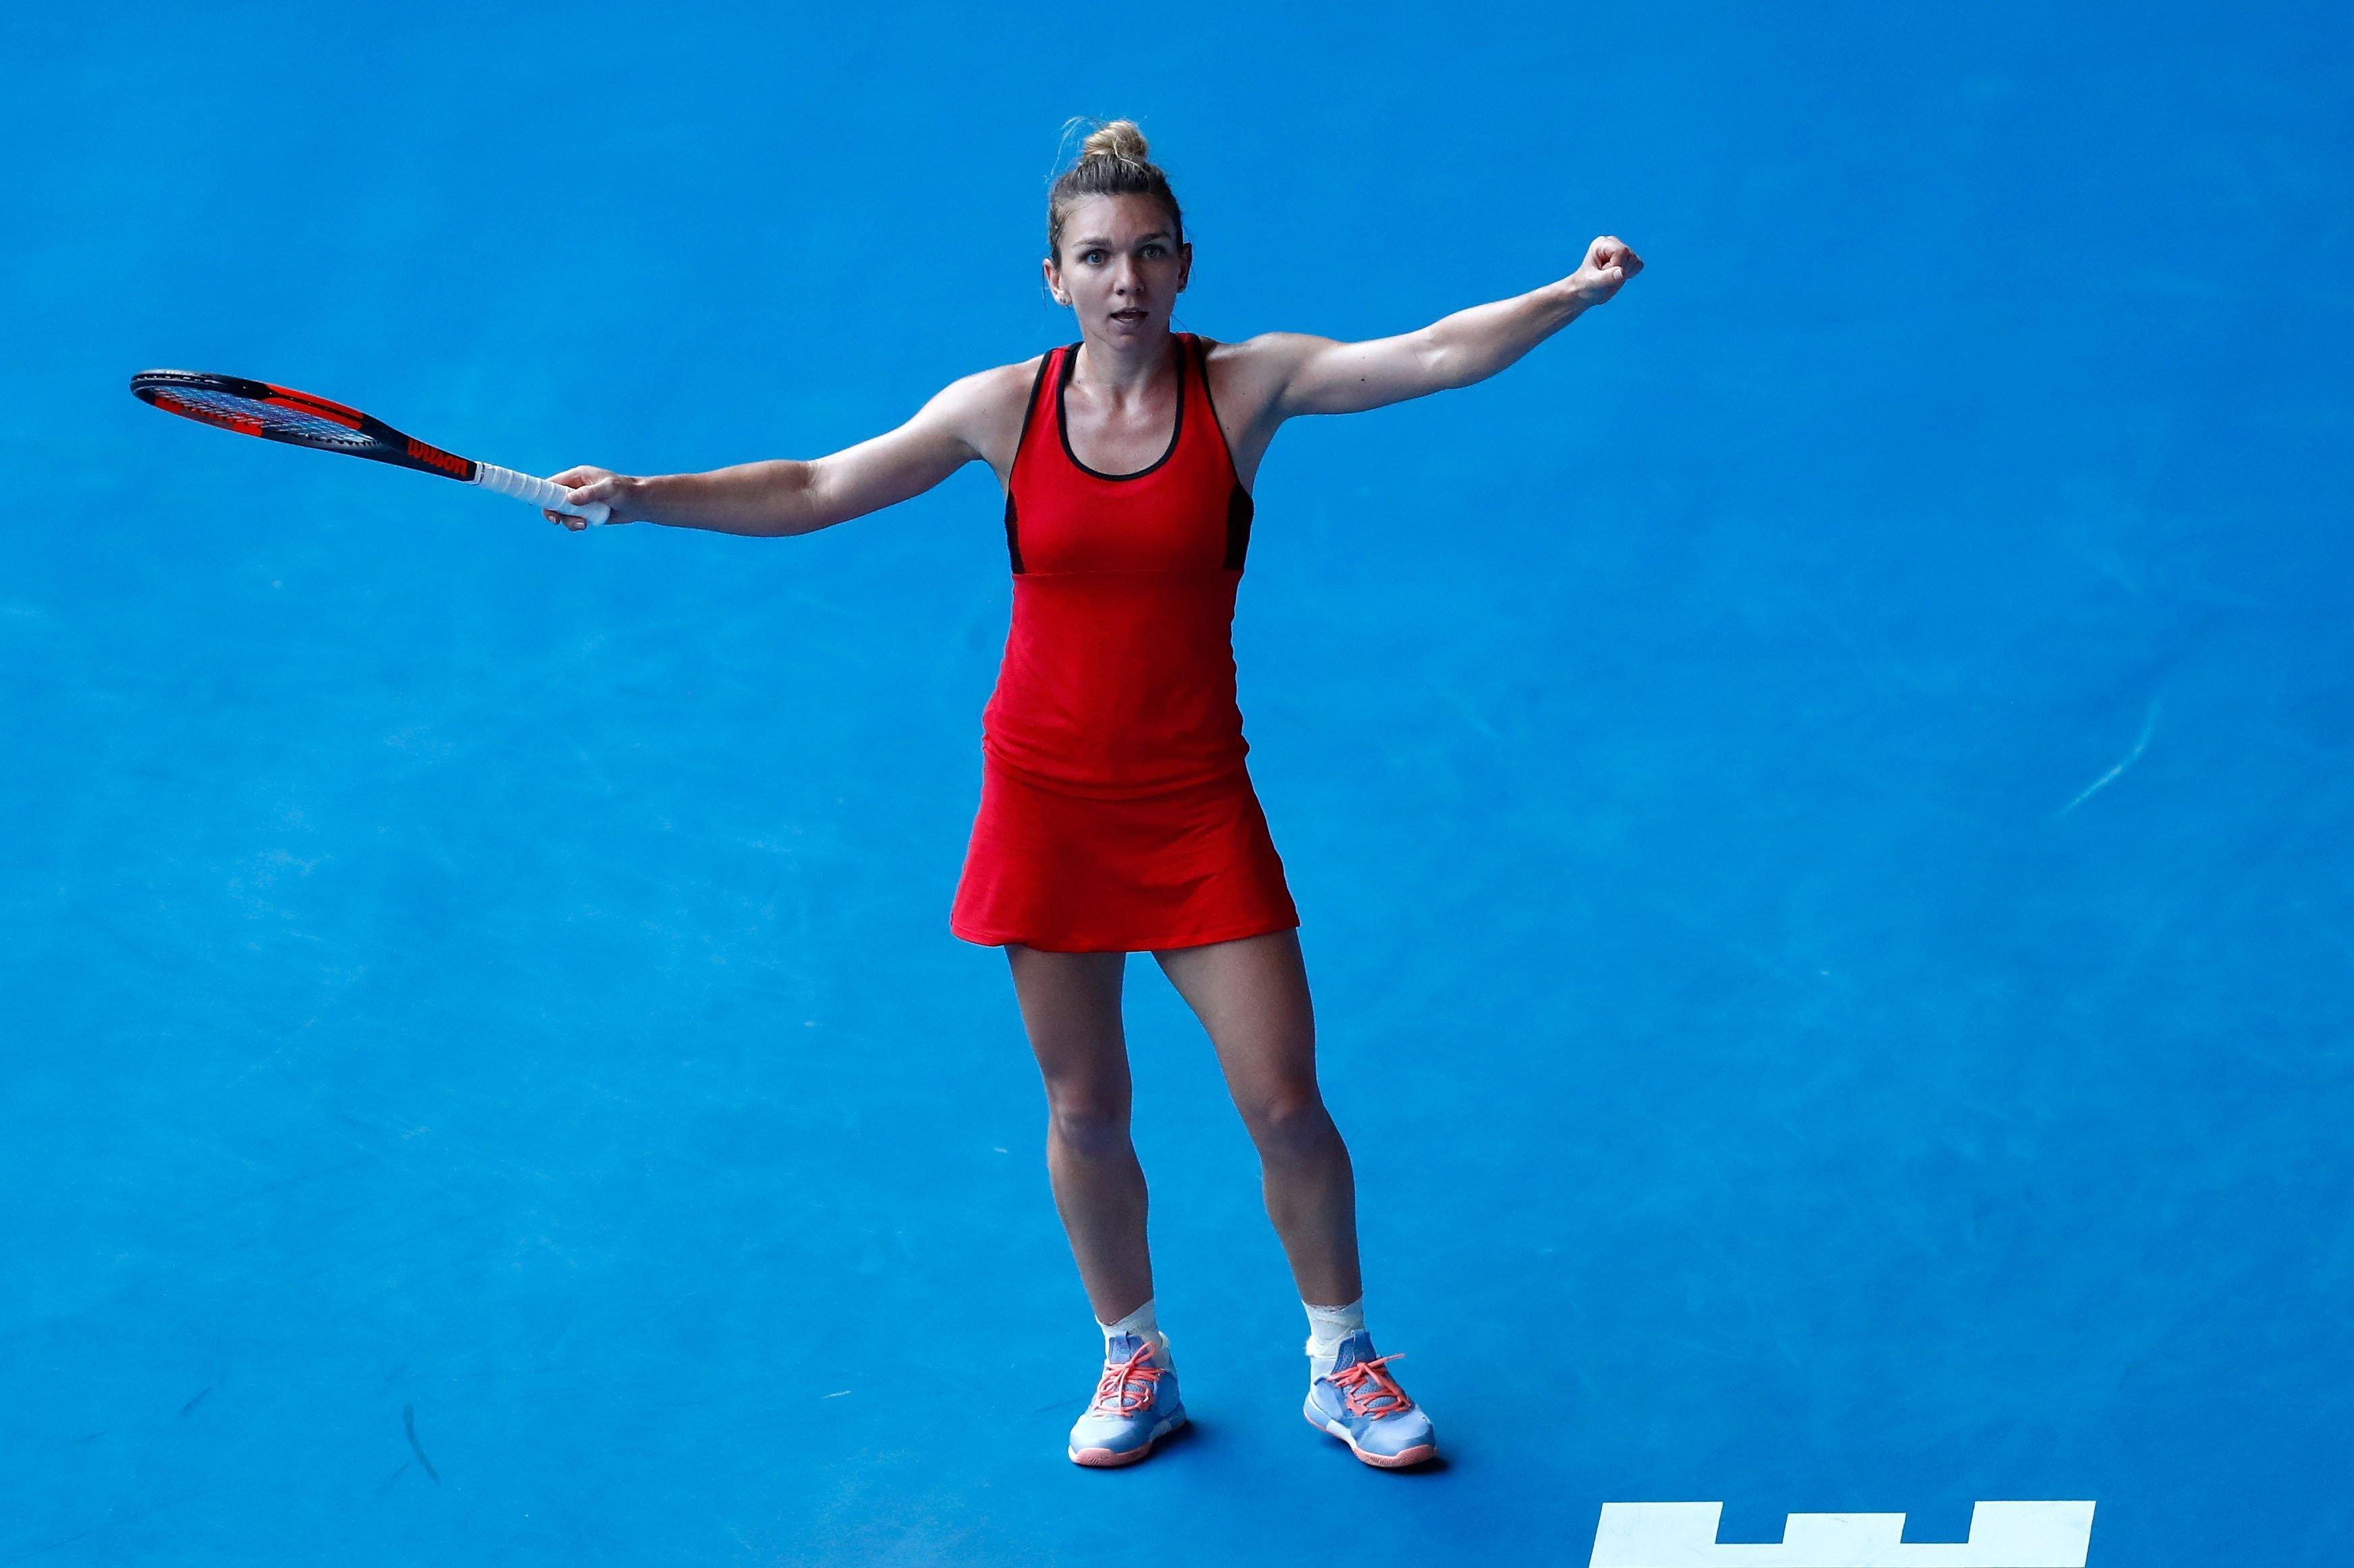 2016 champion Kerber advances to Australian Open semifinals